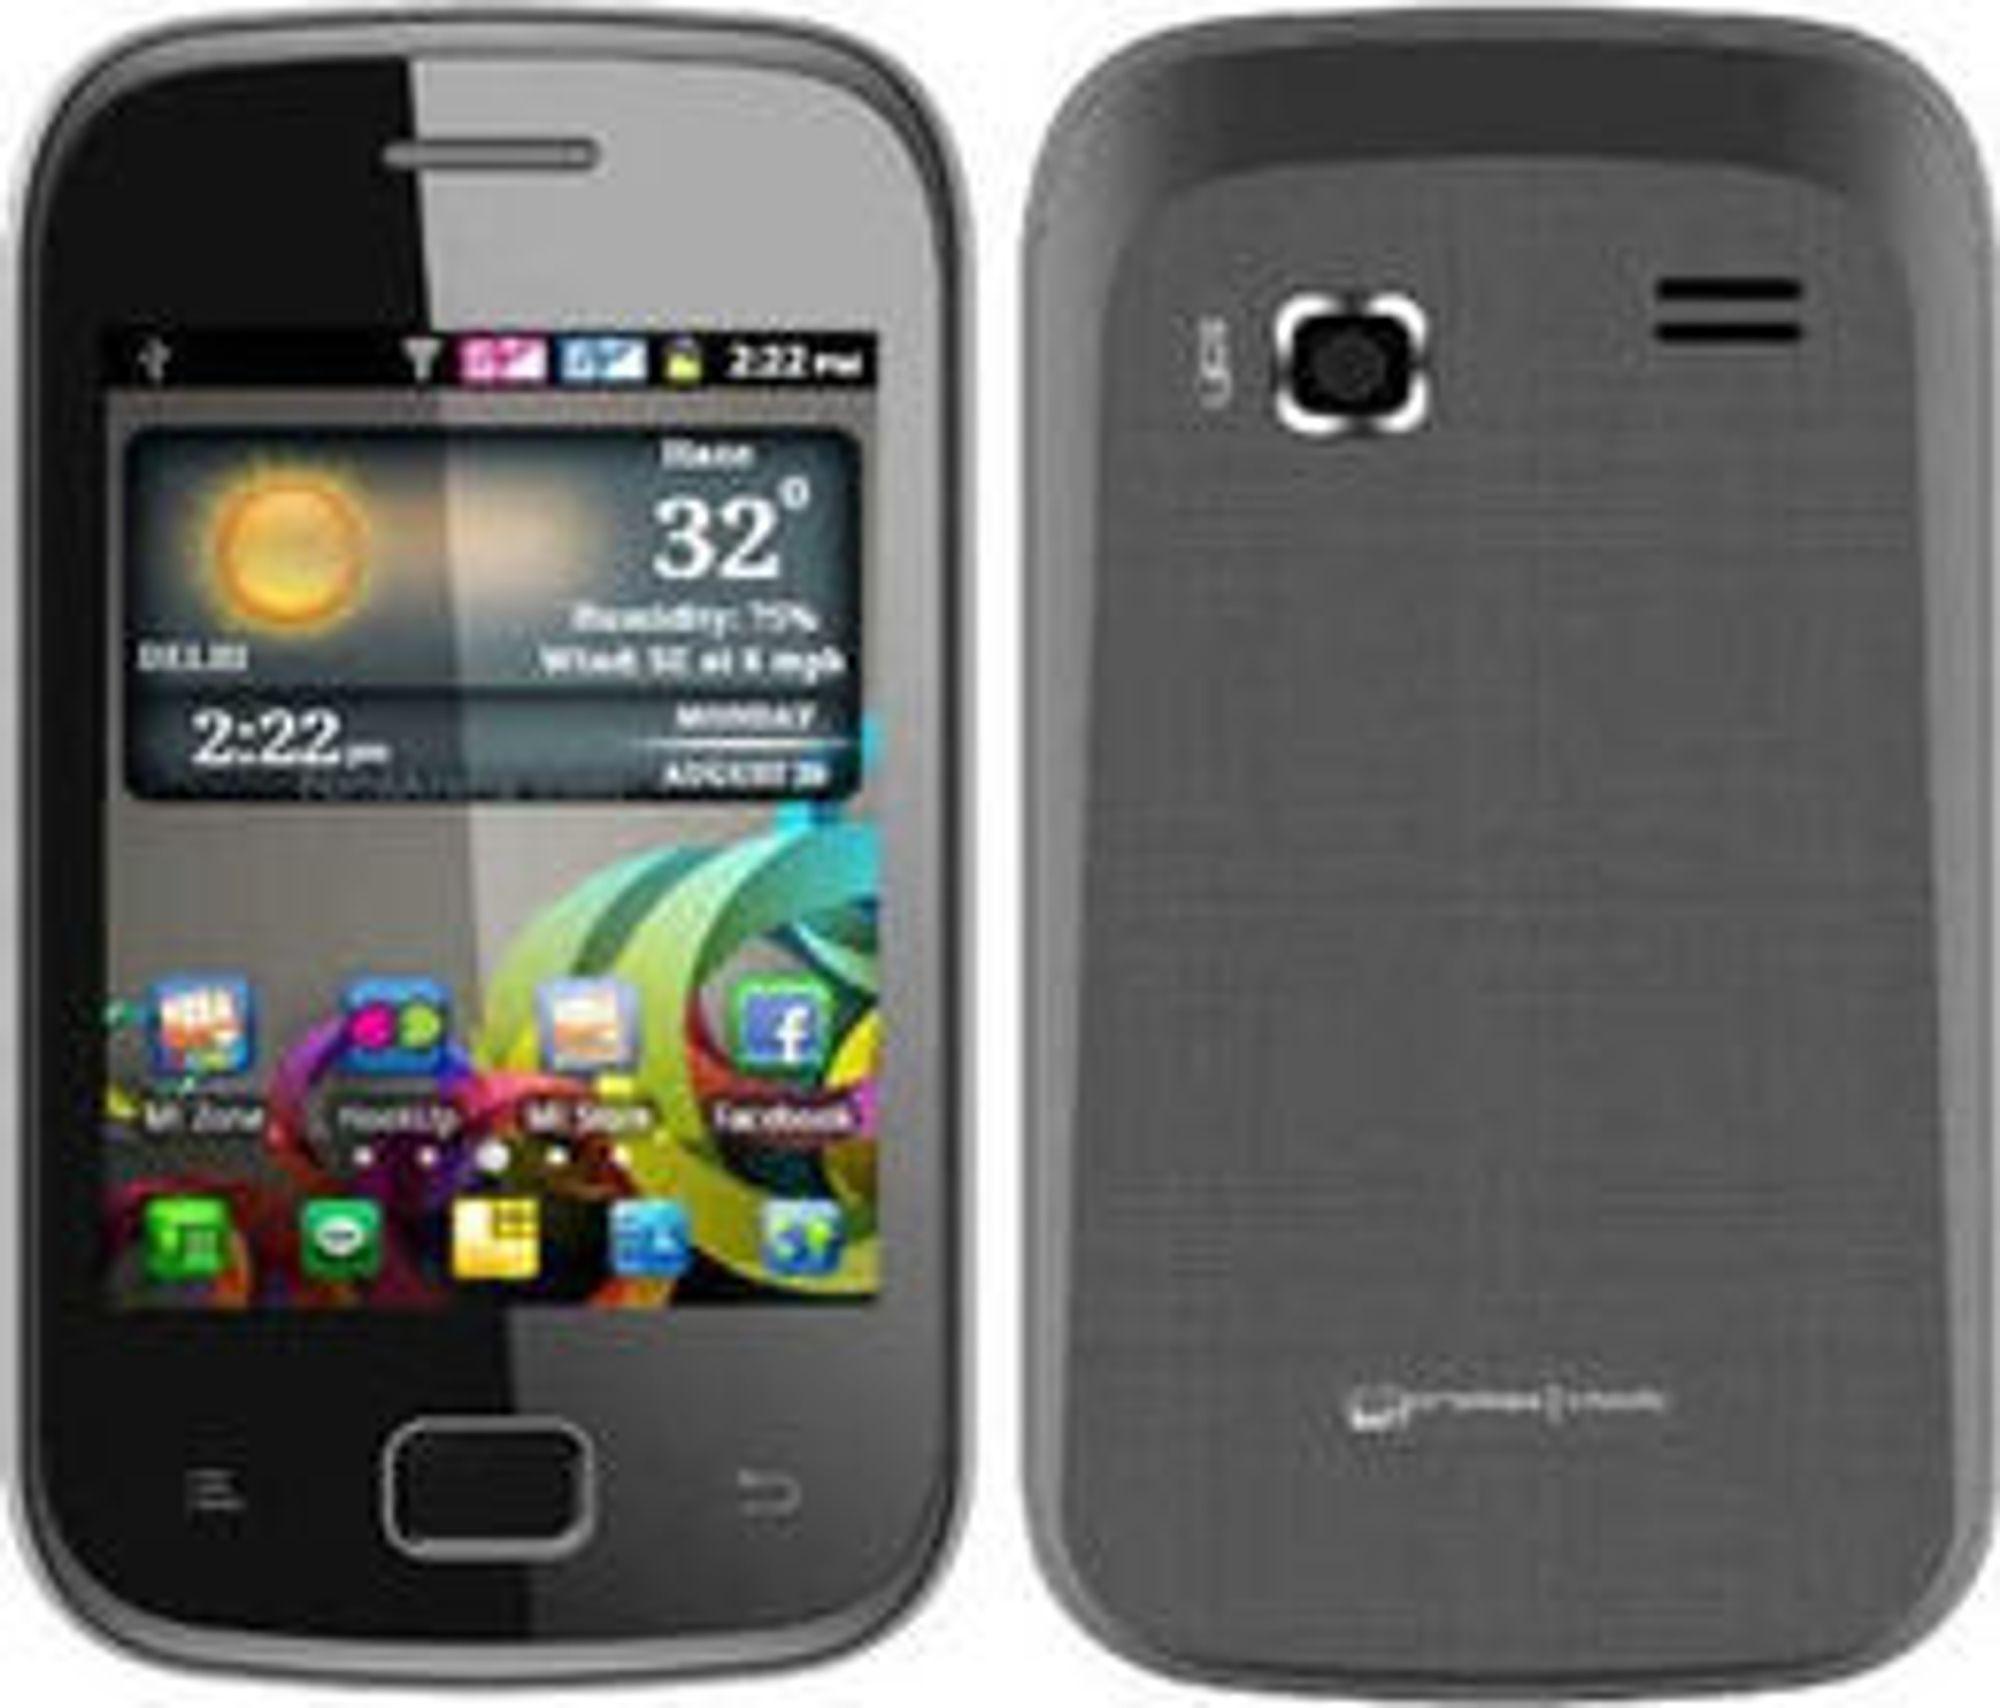 I India koster en iPhone 3GS det samme som ti Android-mobiler av typen Micromax Smarty A30.